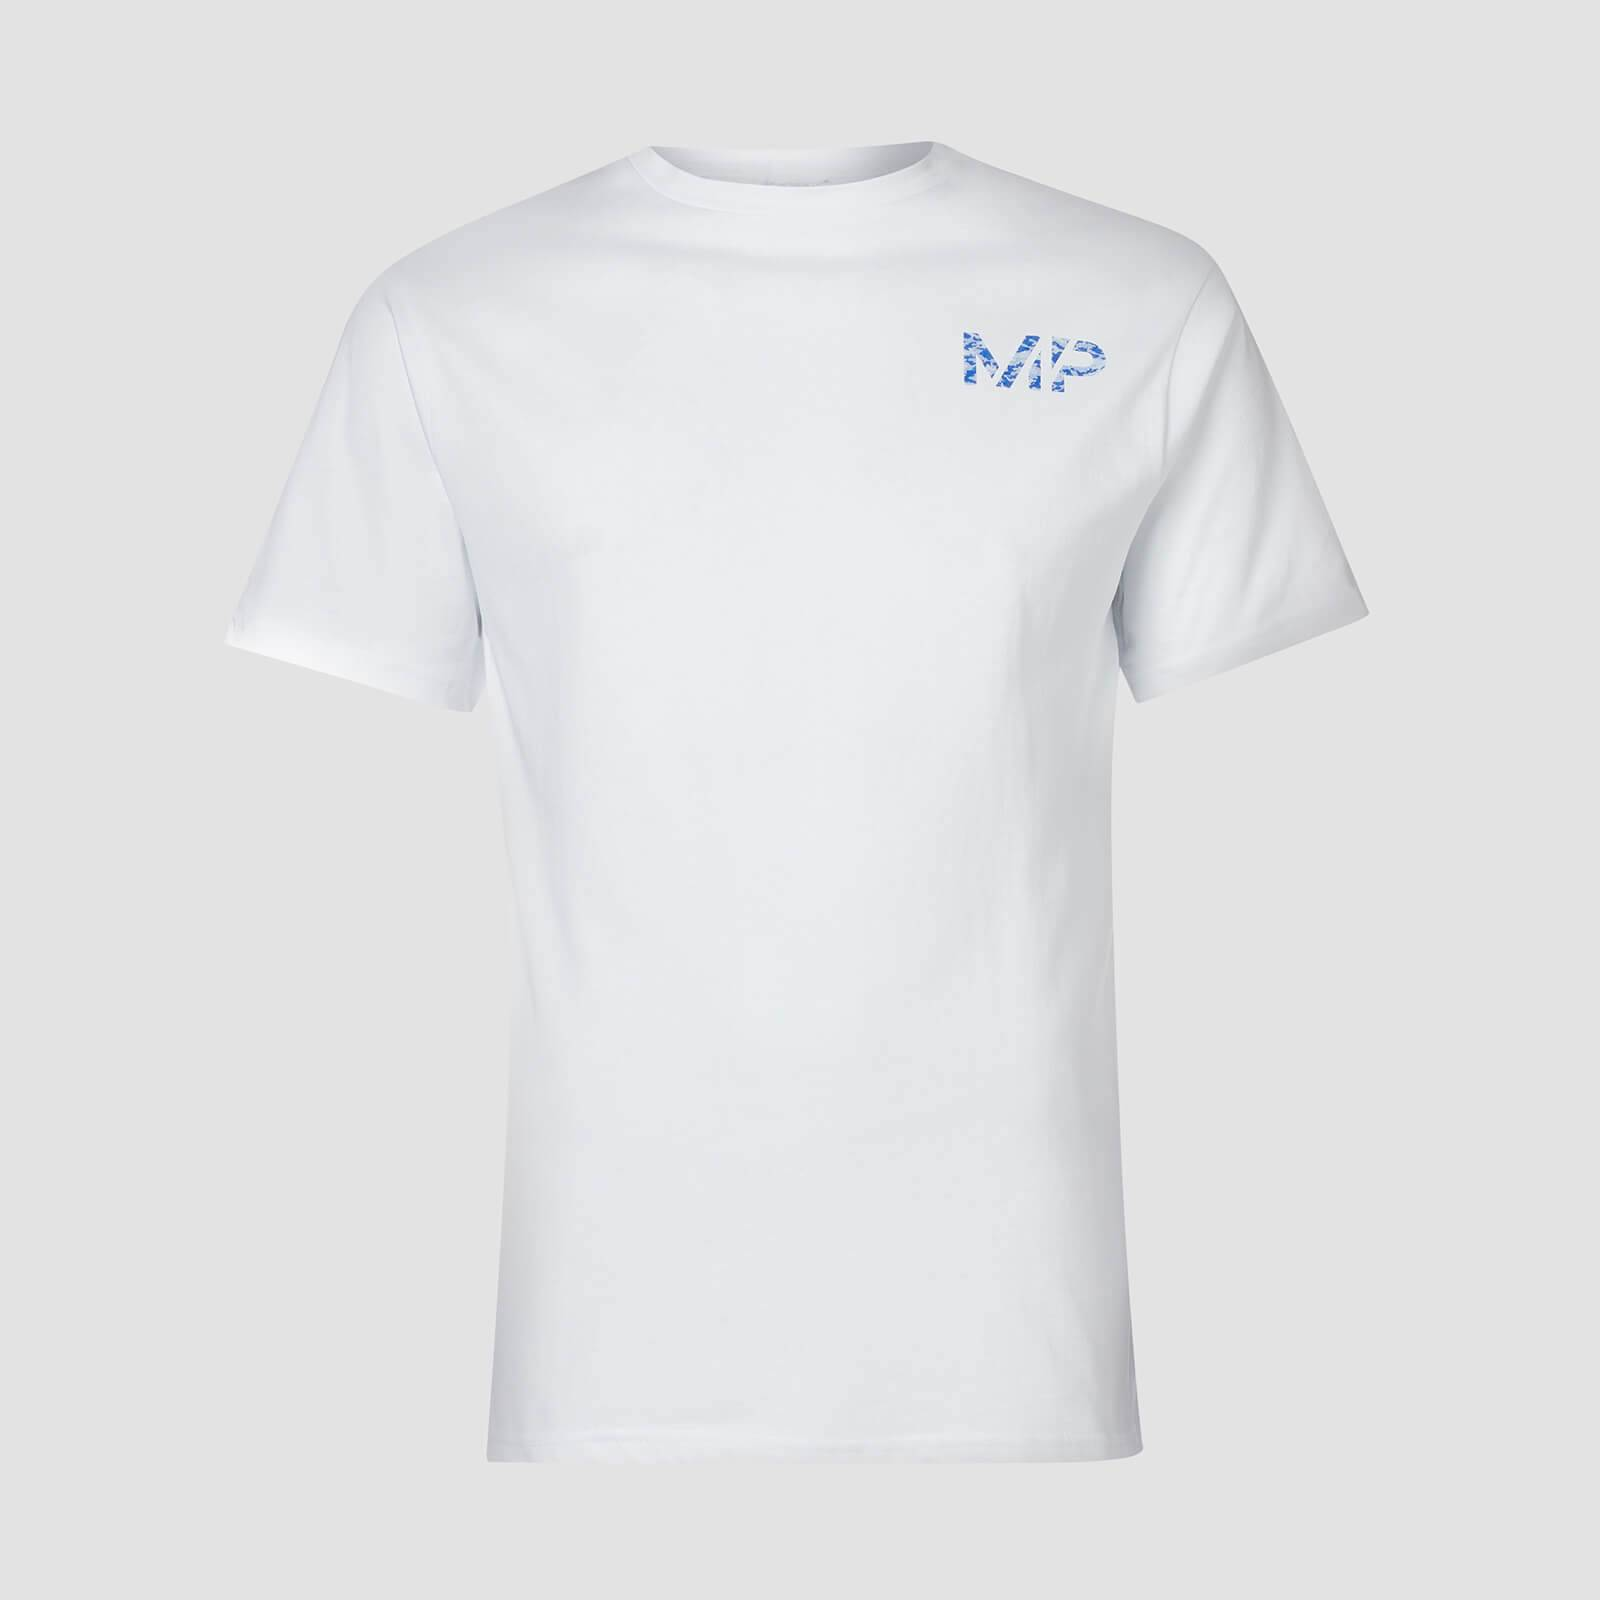 Myprotein T-shirt Geo Camo MP - Bianco - XL